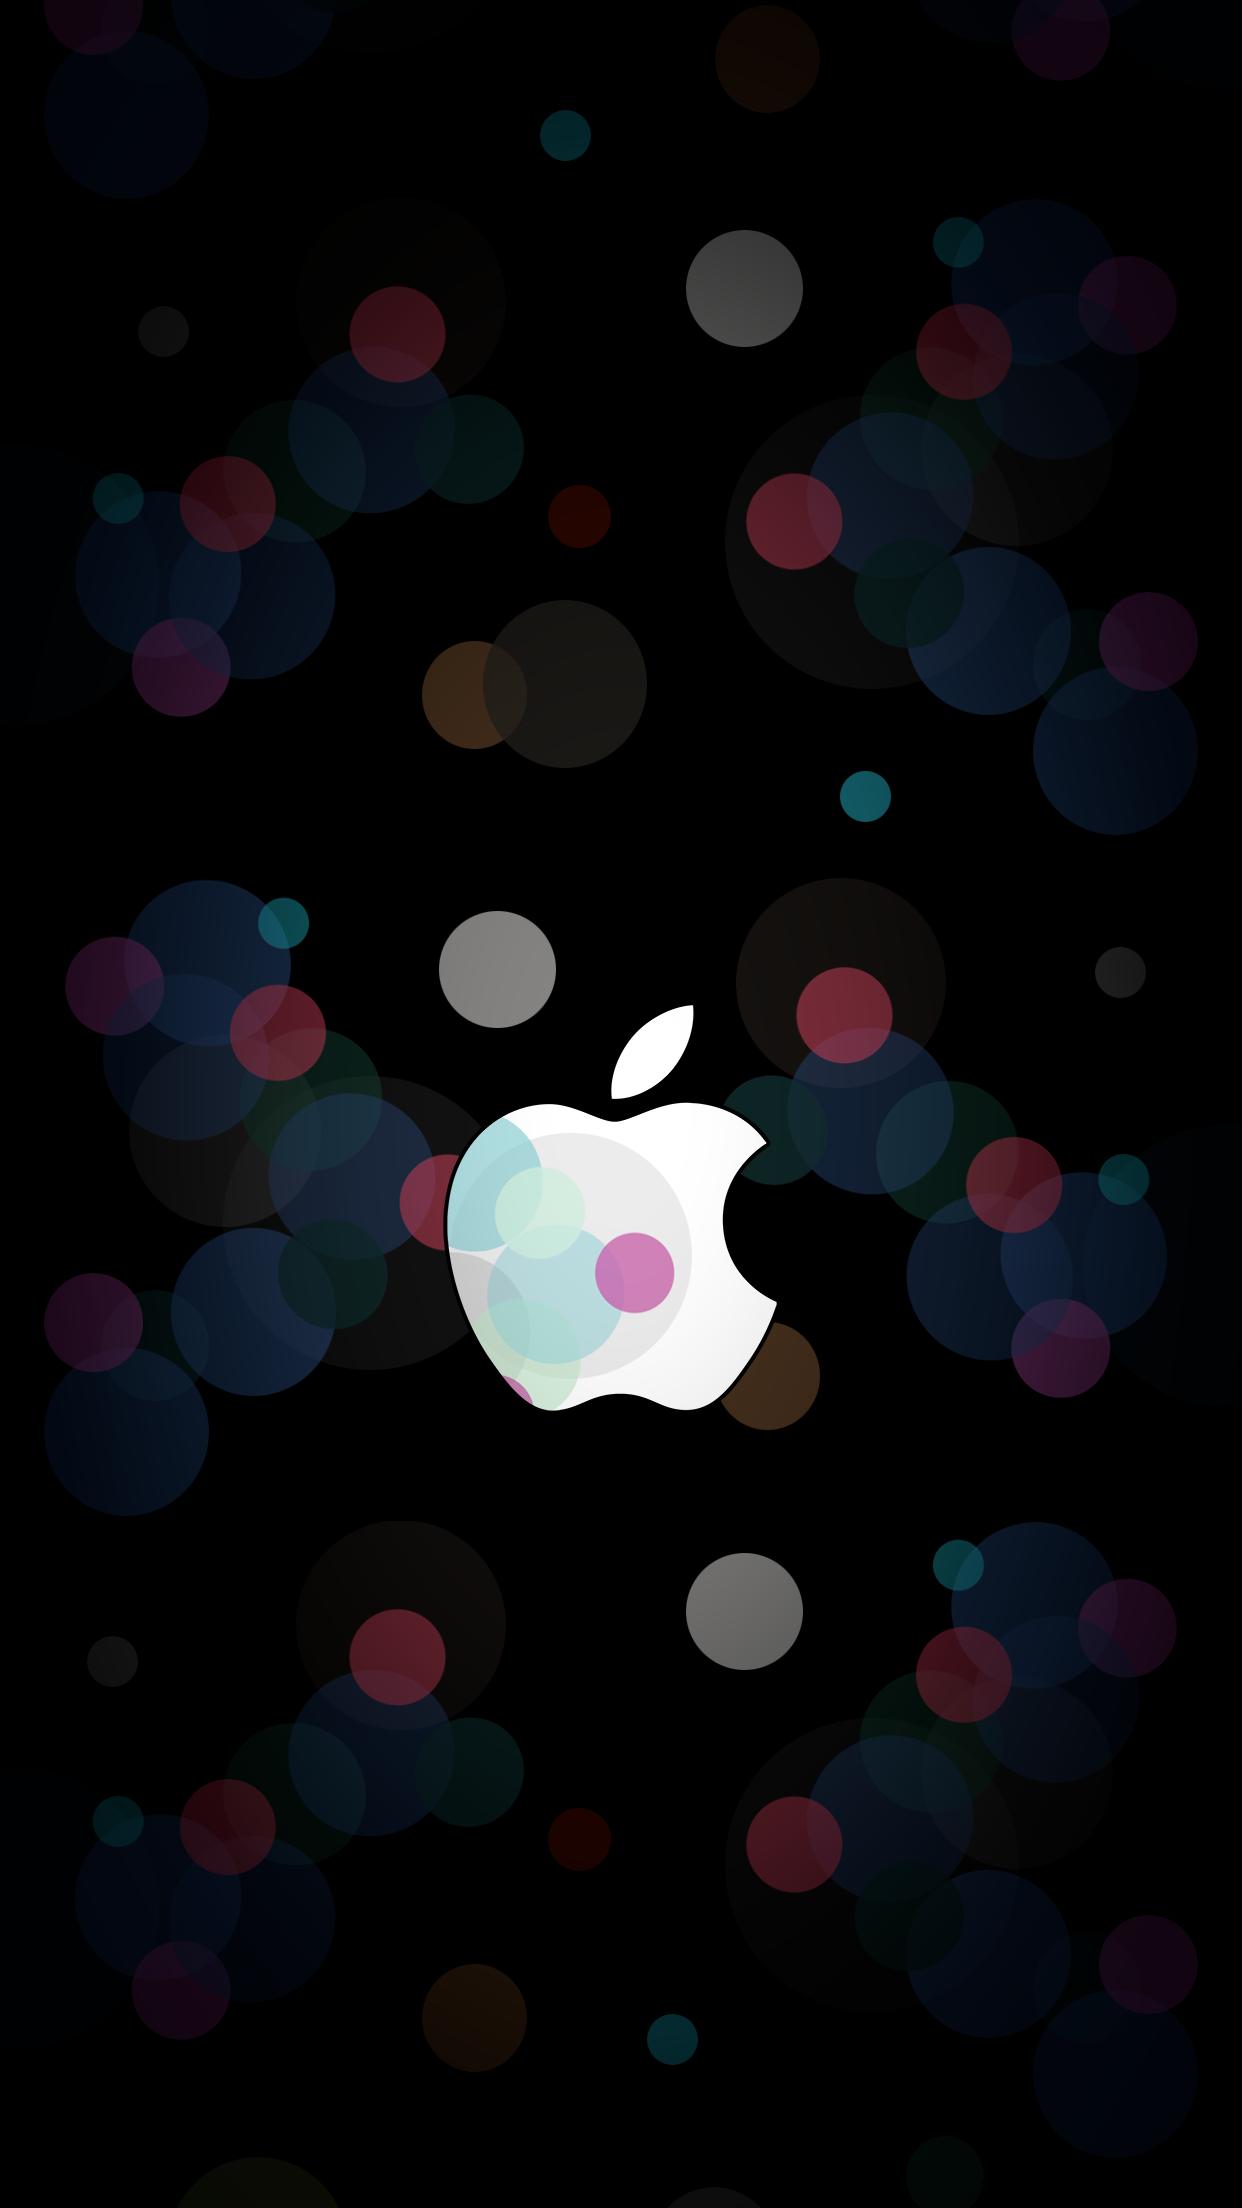 iphone 7発表 スペシャルイベントの画像を使った壁紙 appleの噂 news